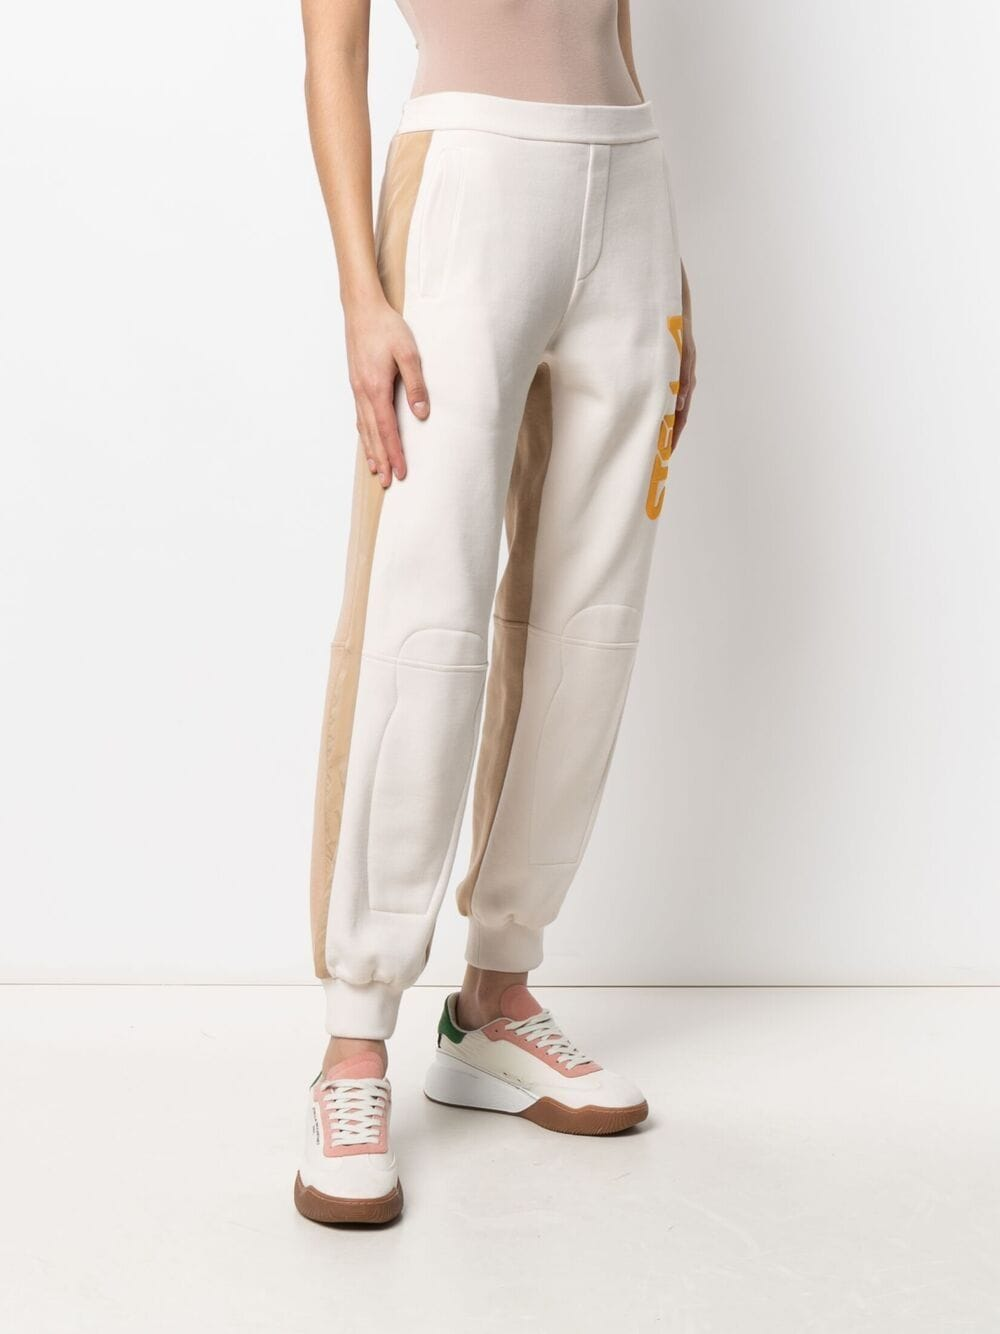 Cream beige and yellow cotton Stella McCartney logo track pants STELLA MC CARTNEY      603658-SOW799201